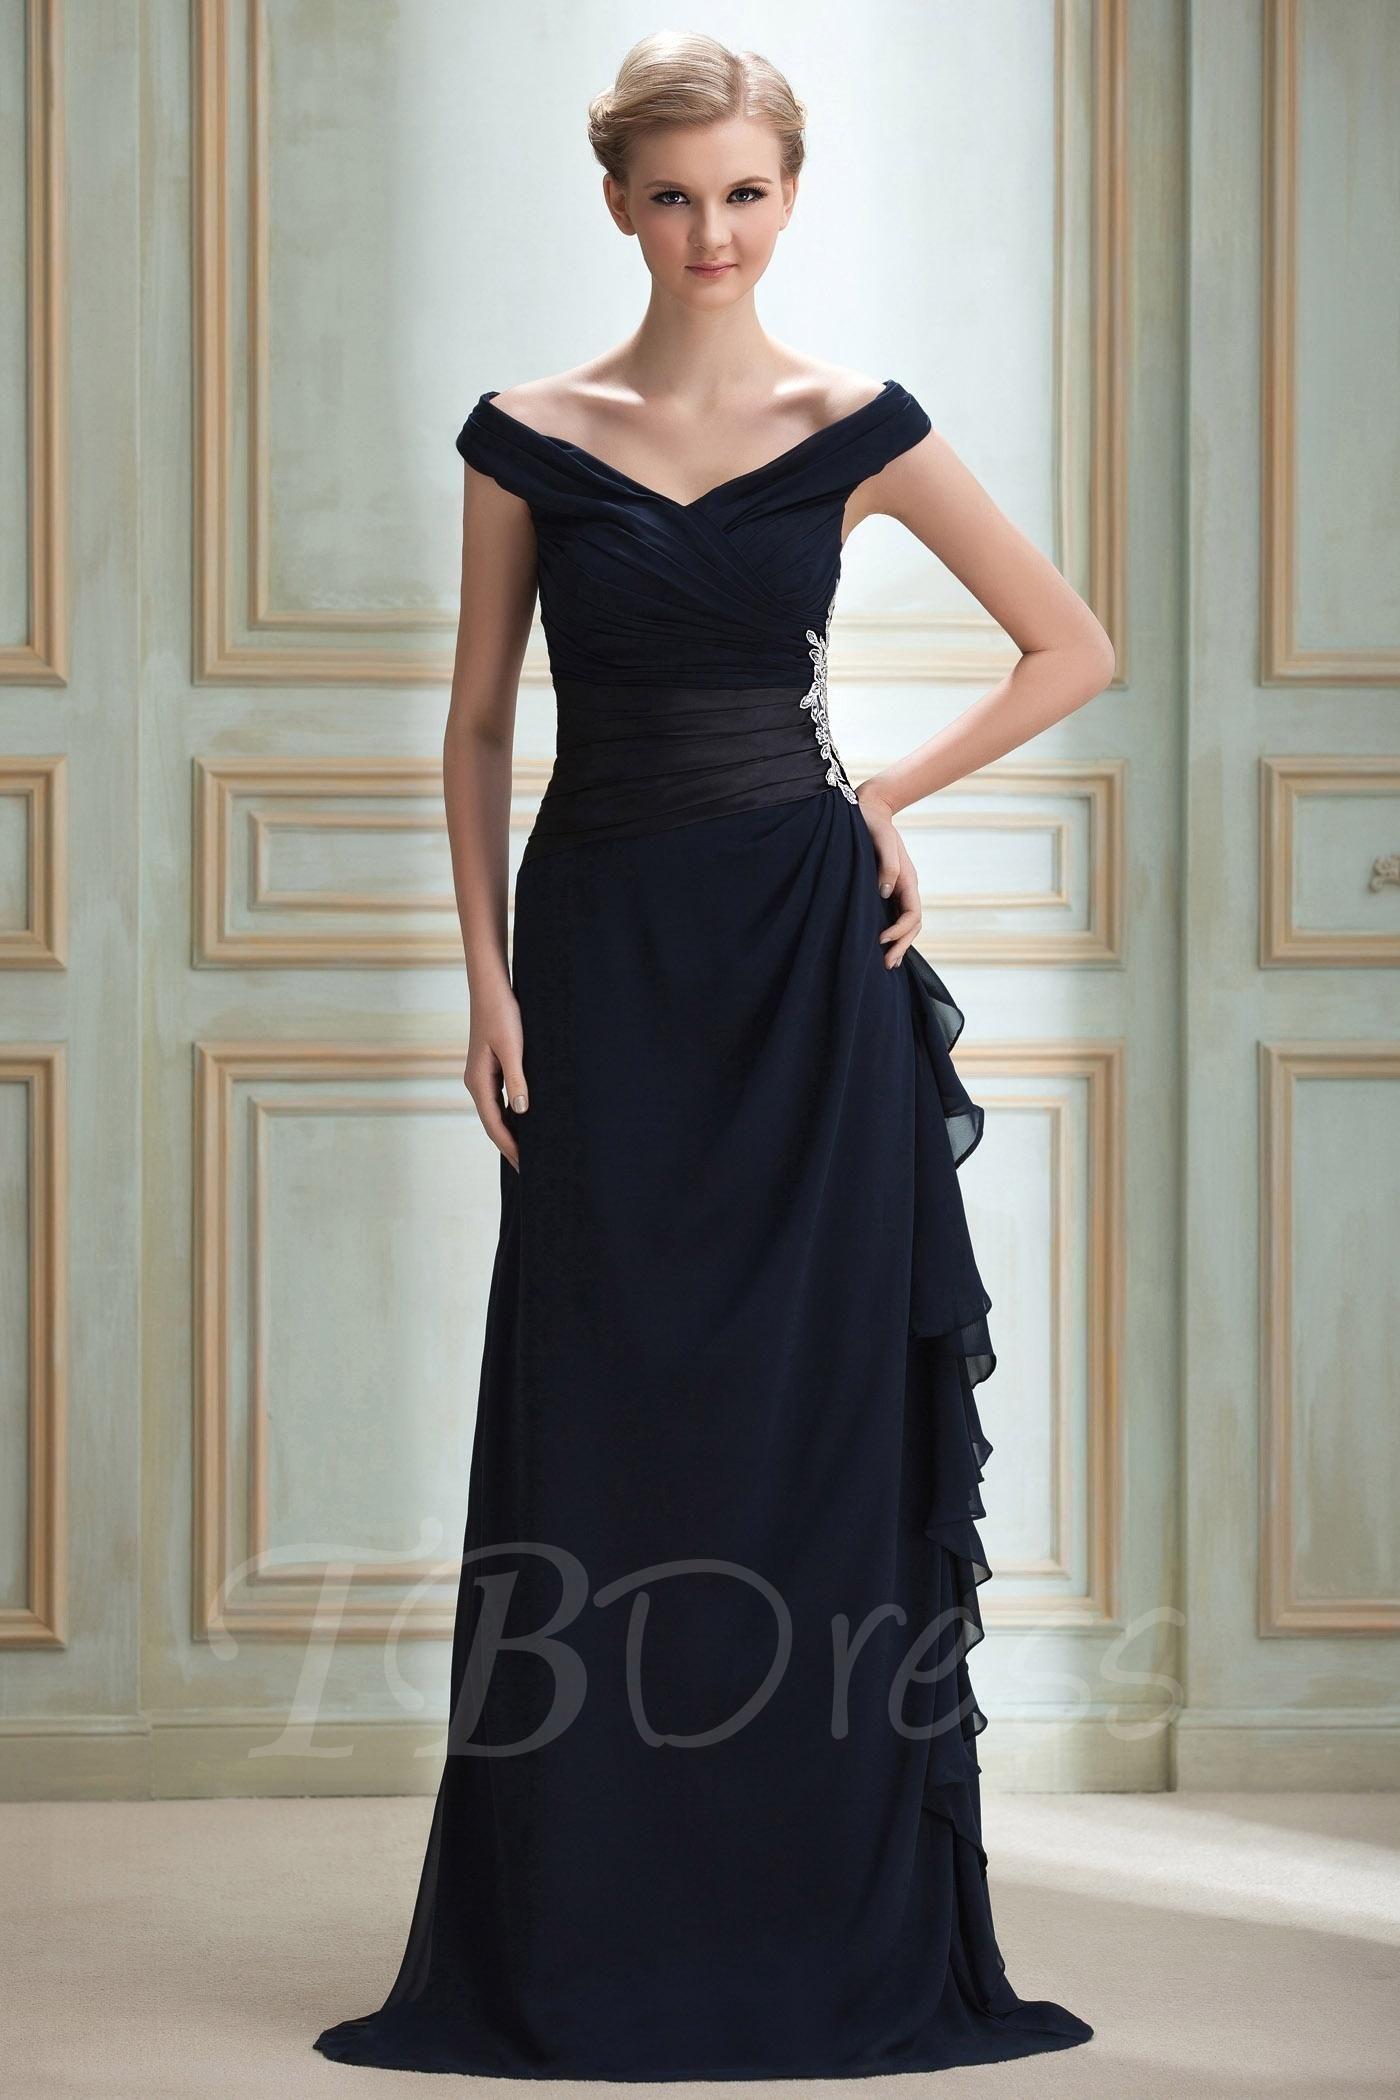 Ruched Sheath/Column Off-The-Shoulder Appliques Long Prom Dress ...